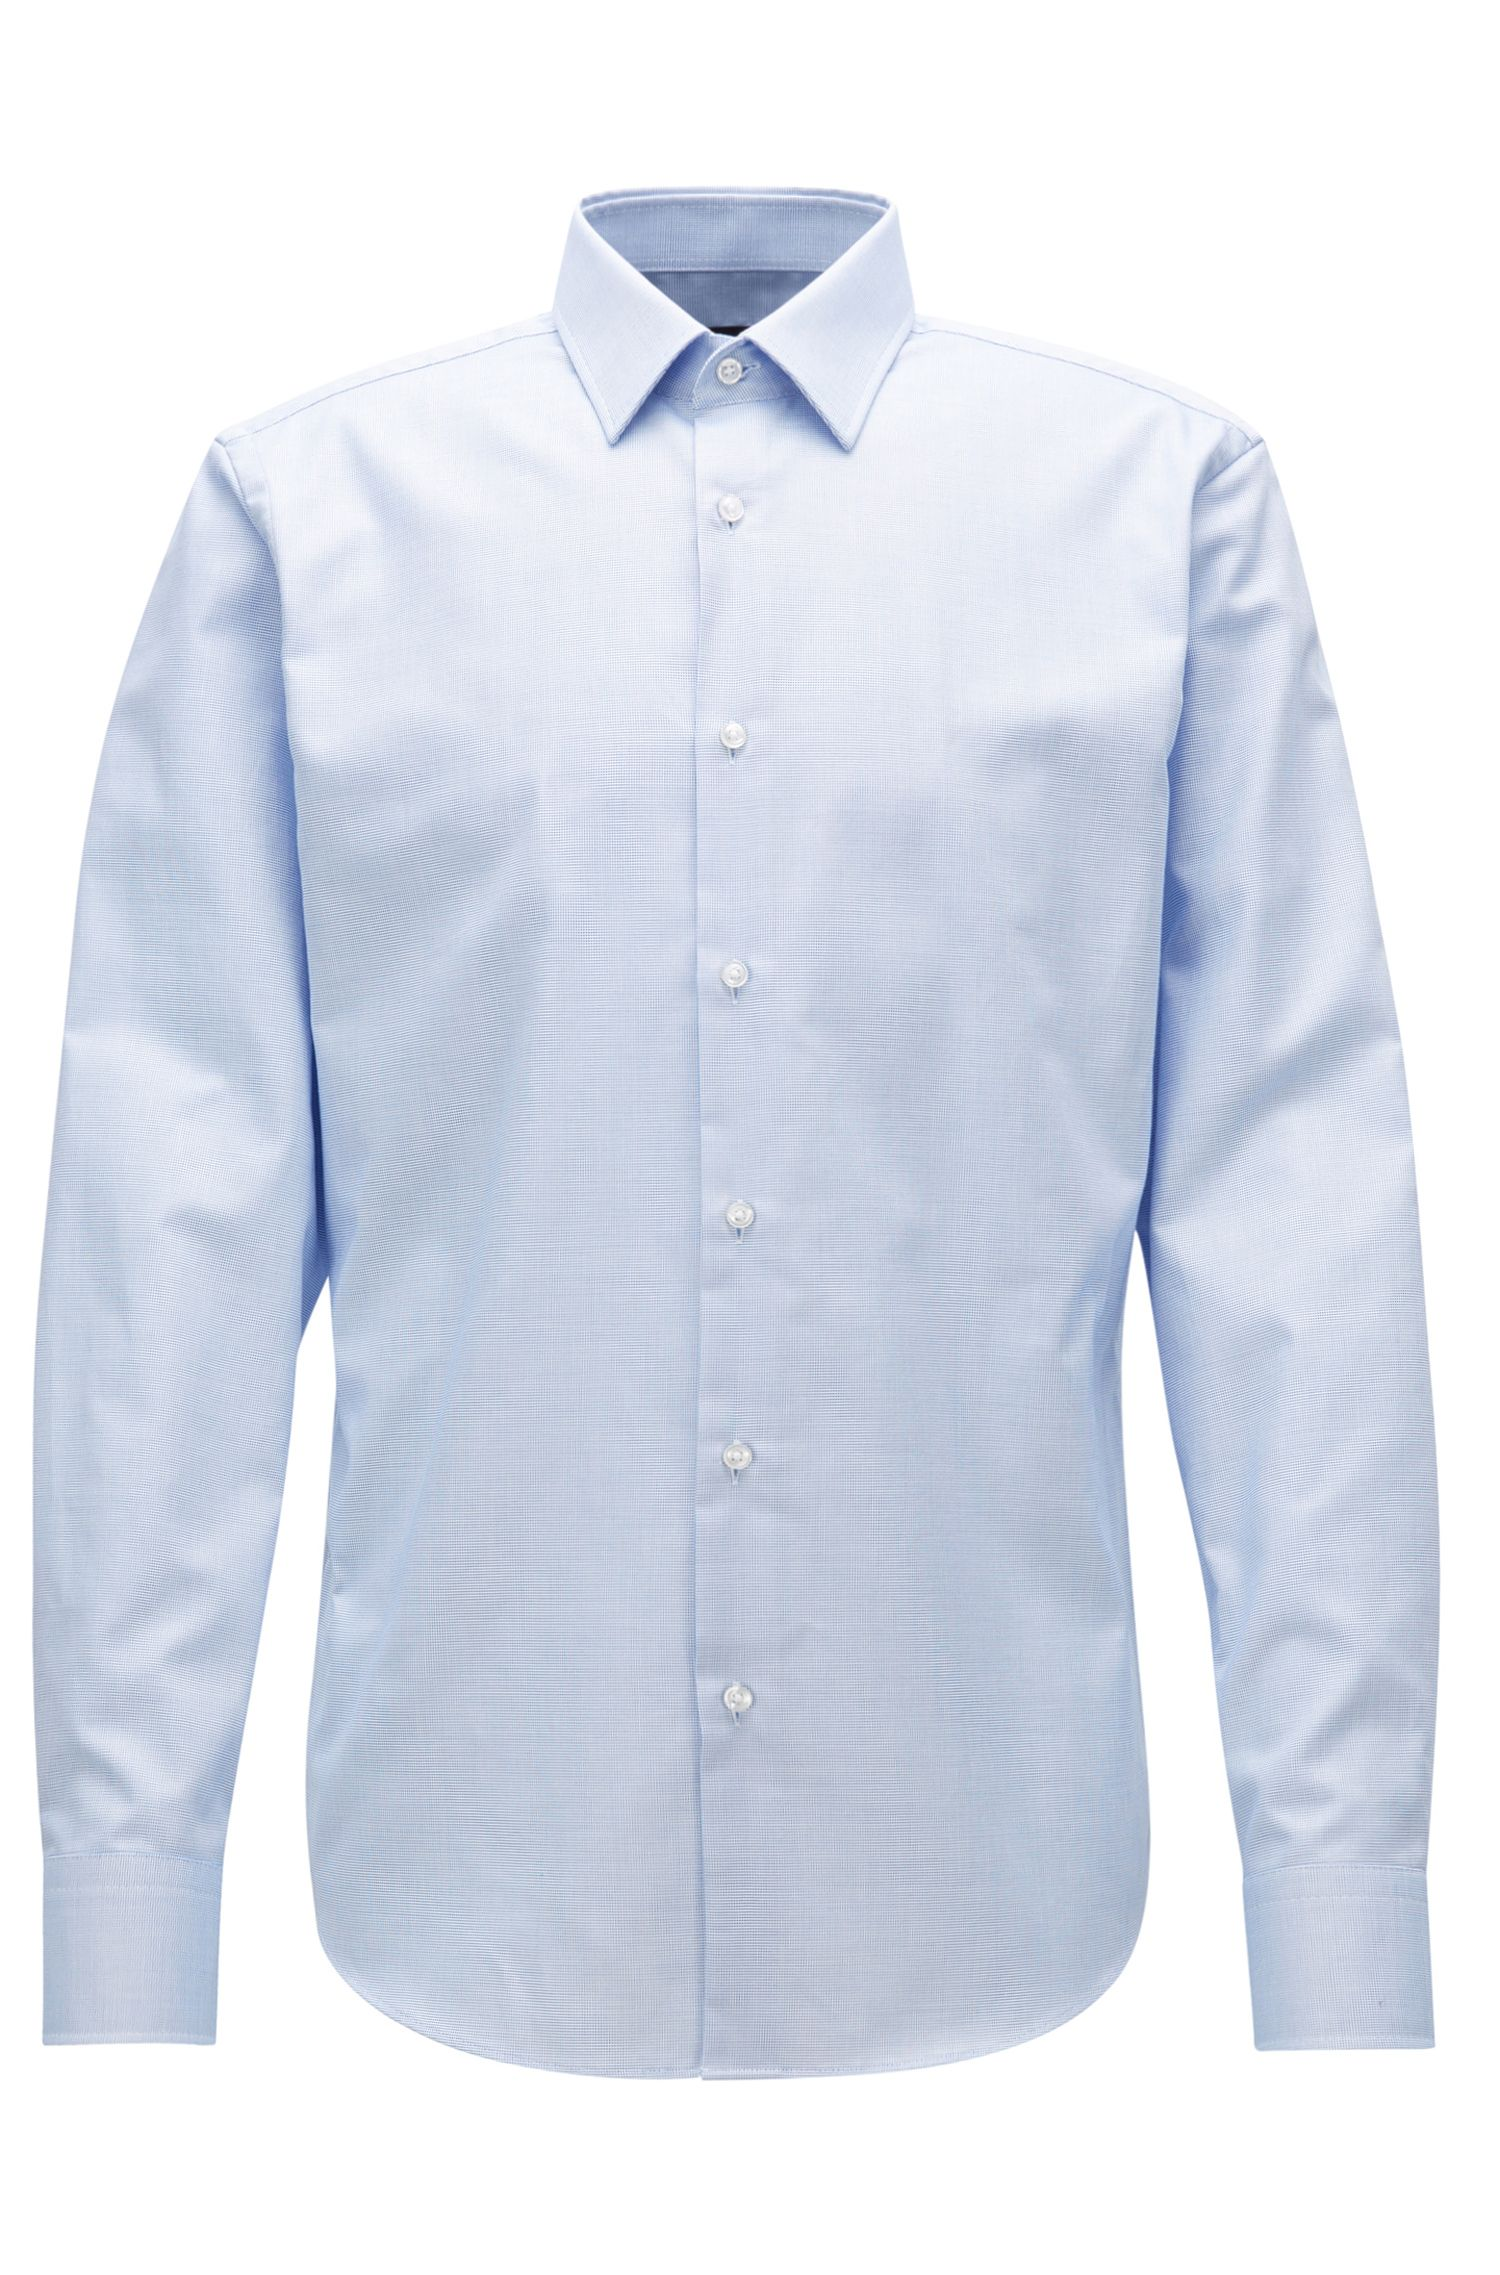 Regular-fit shirt in cotton poplin